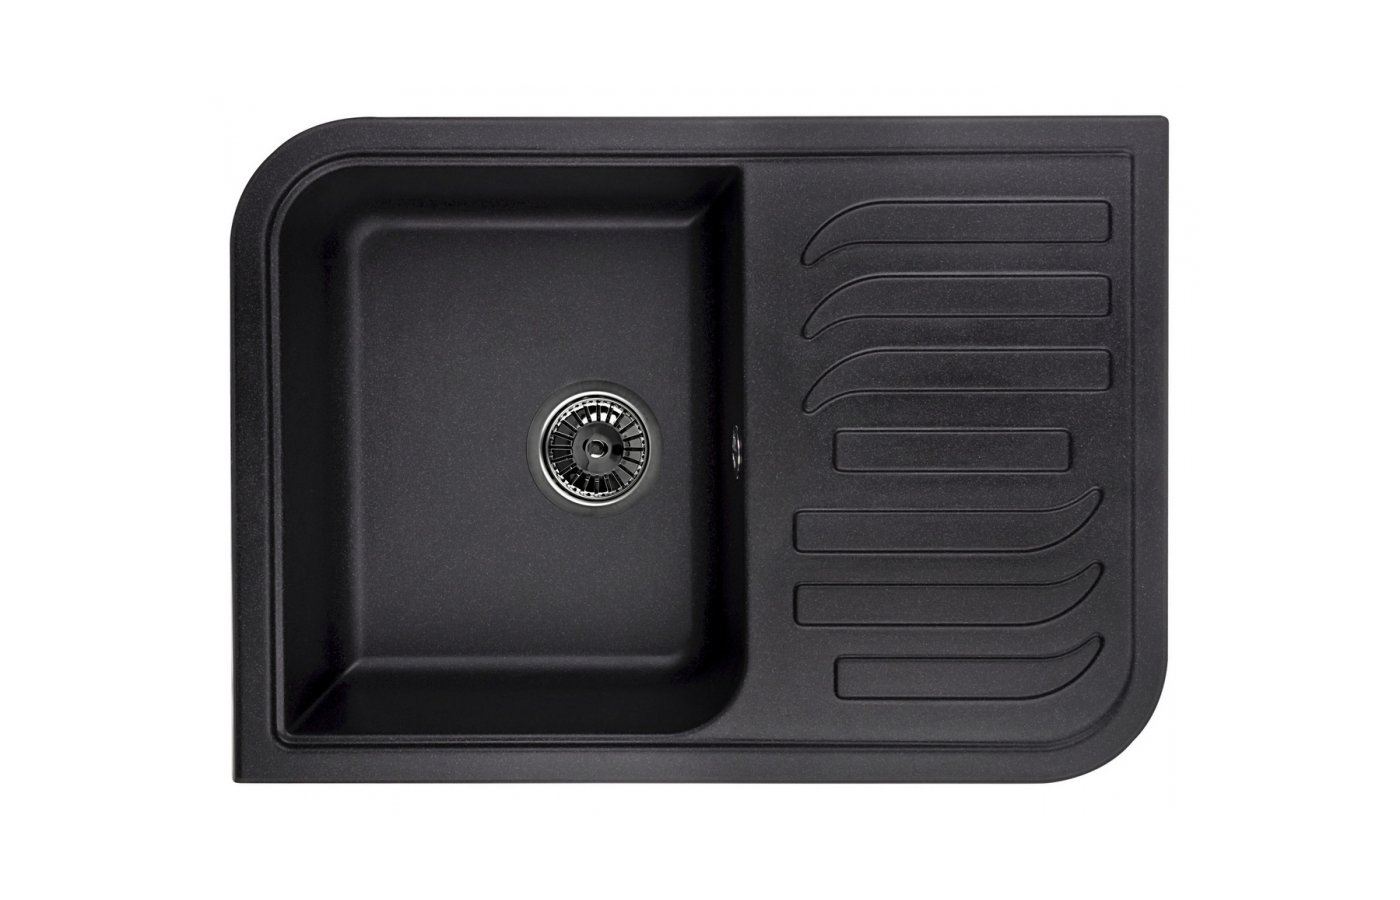 Кухонная мойка Weissgauff SOFTLINE 695 Eco Granit серый беж